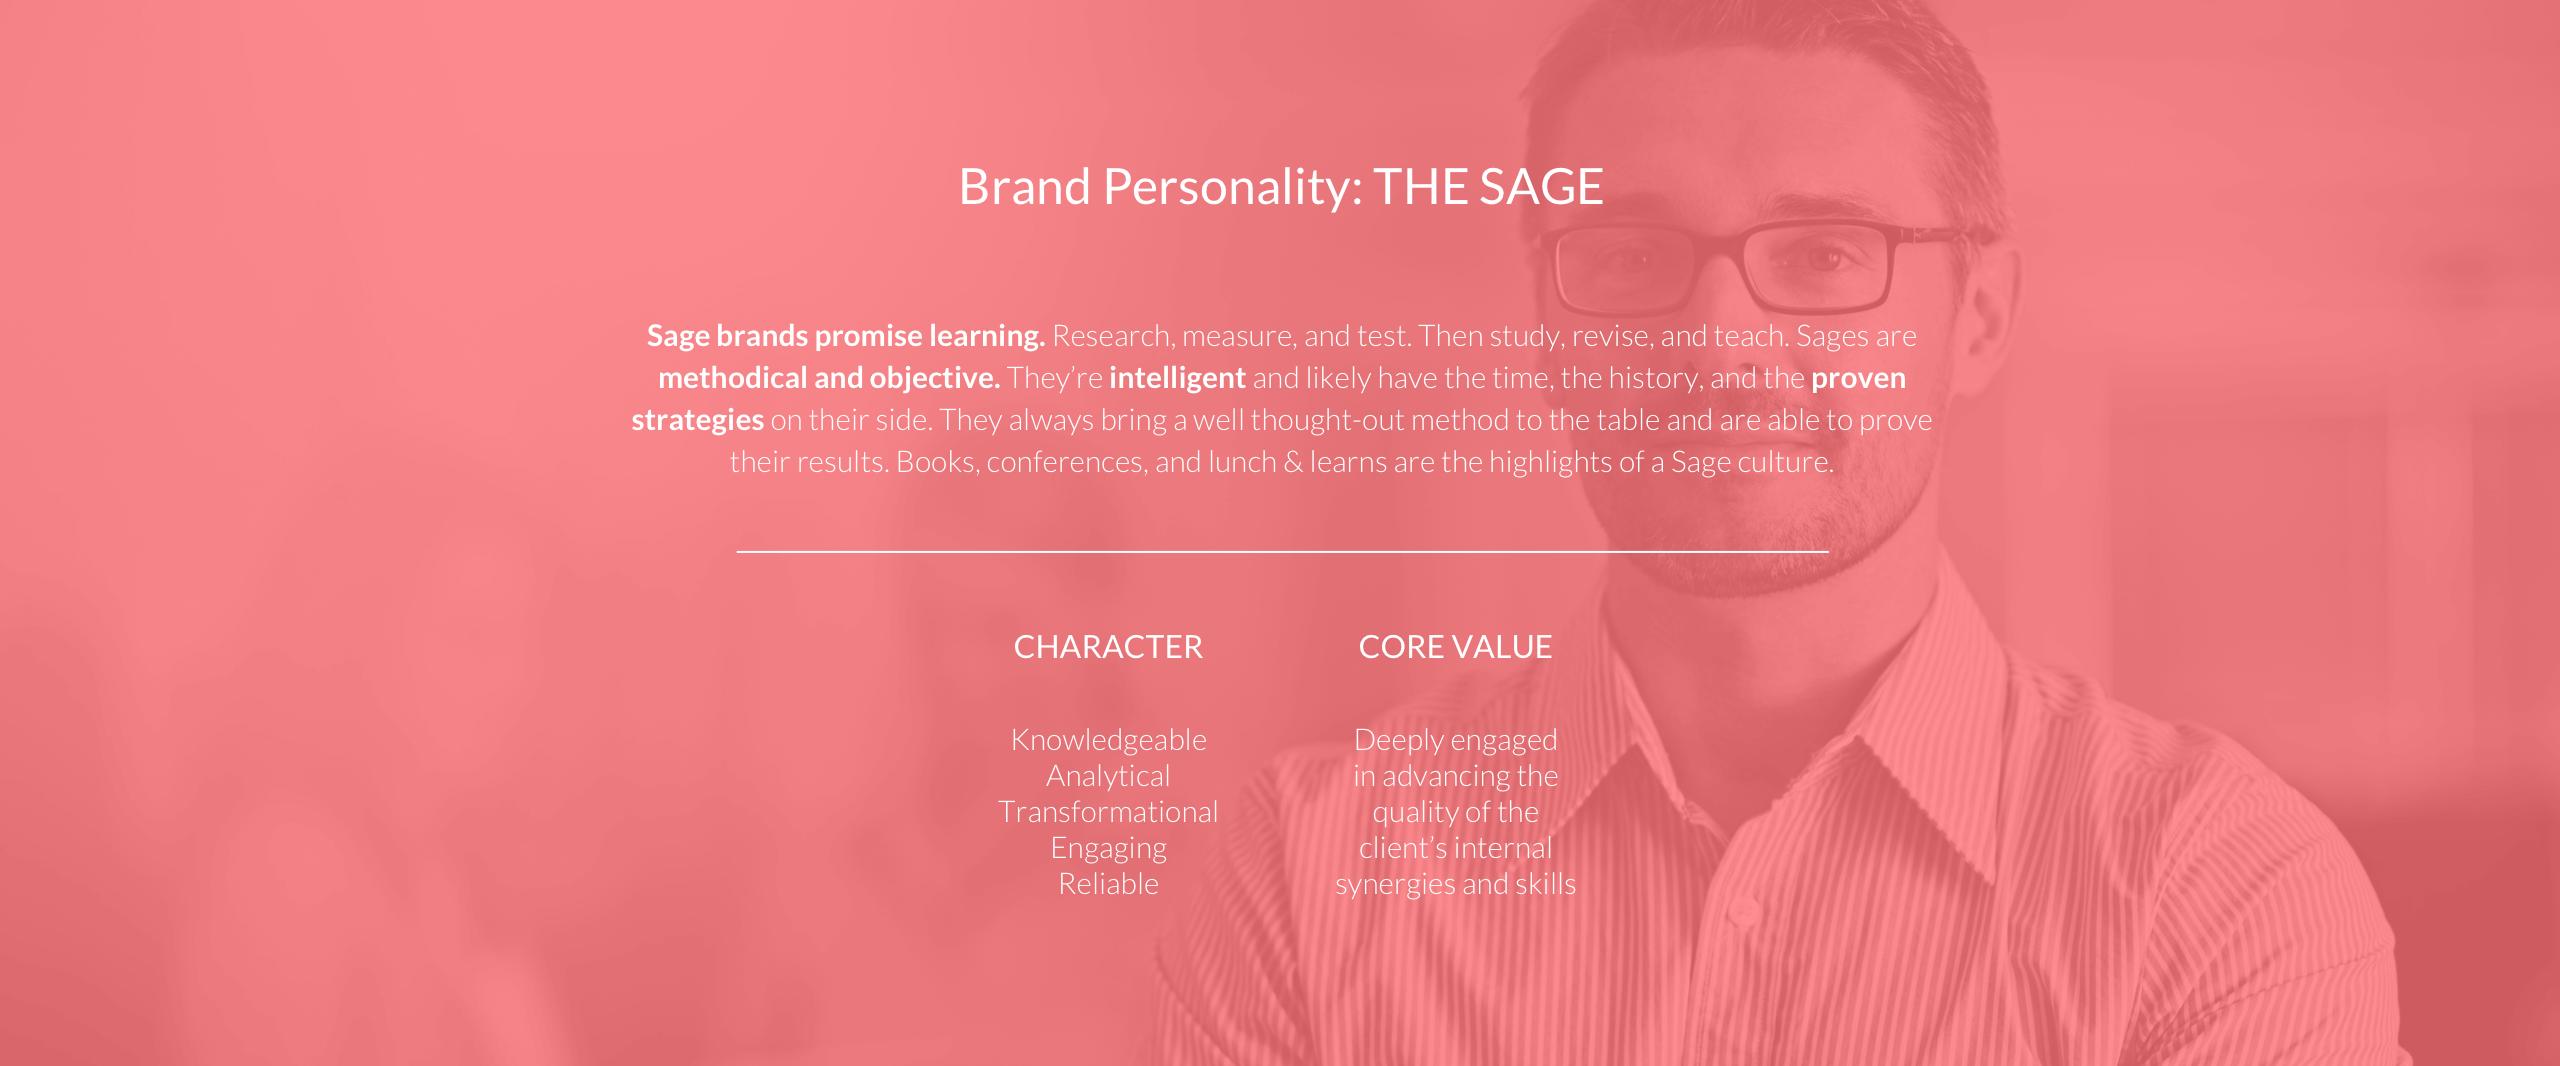 brand_personality_peripheri